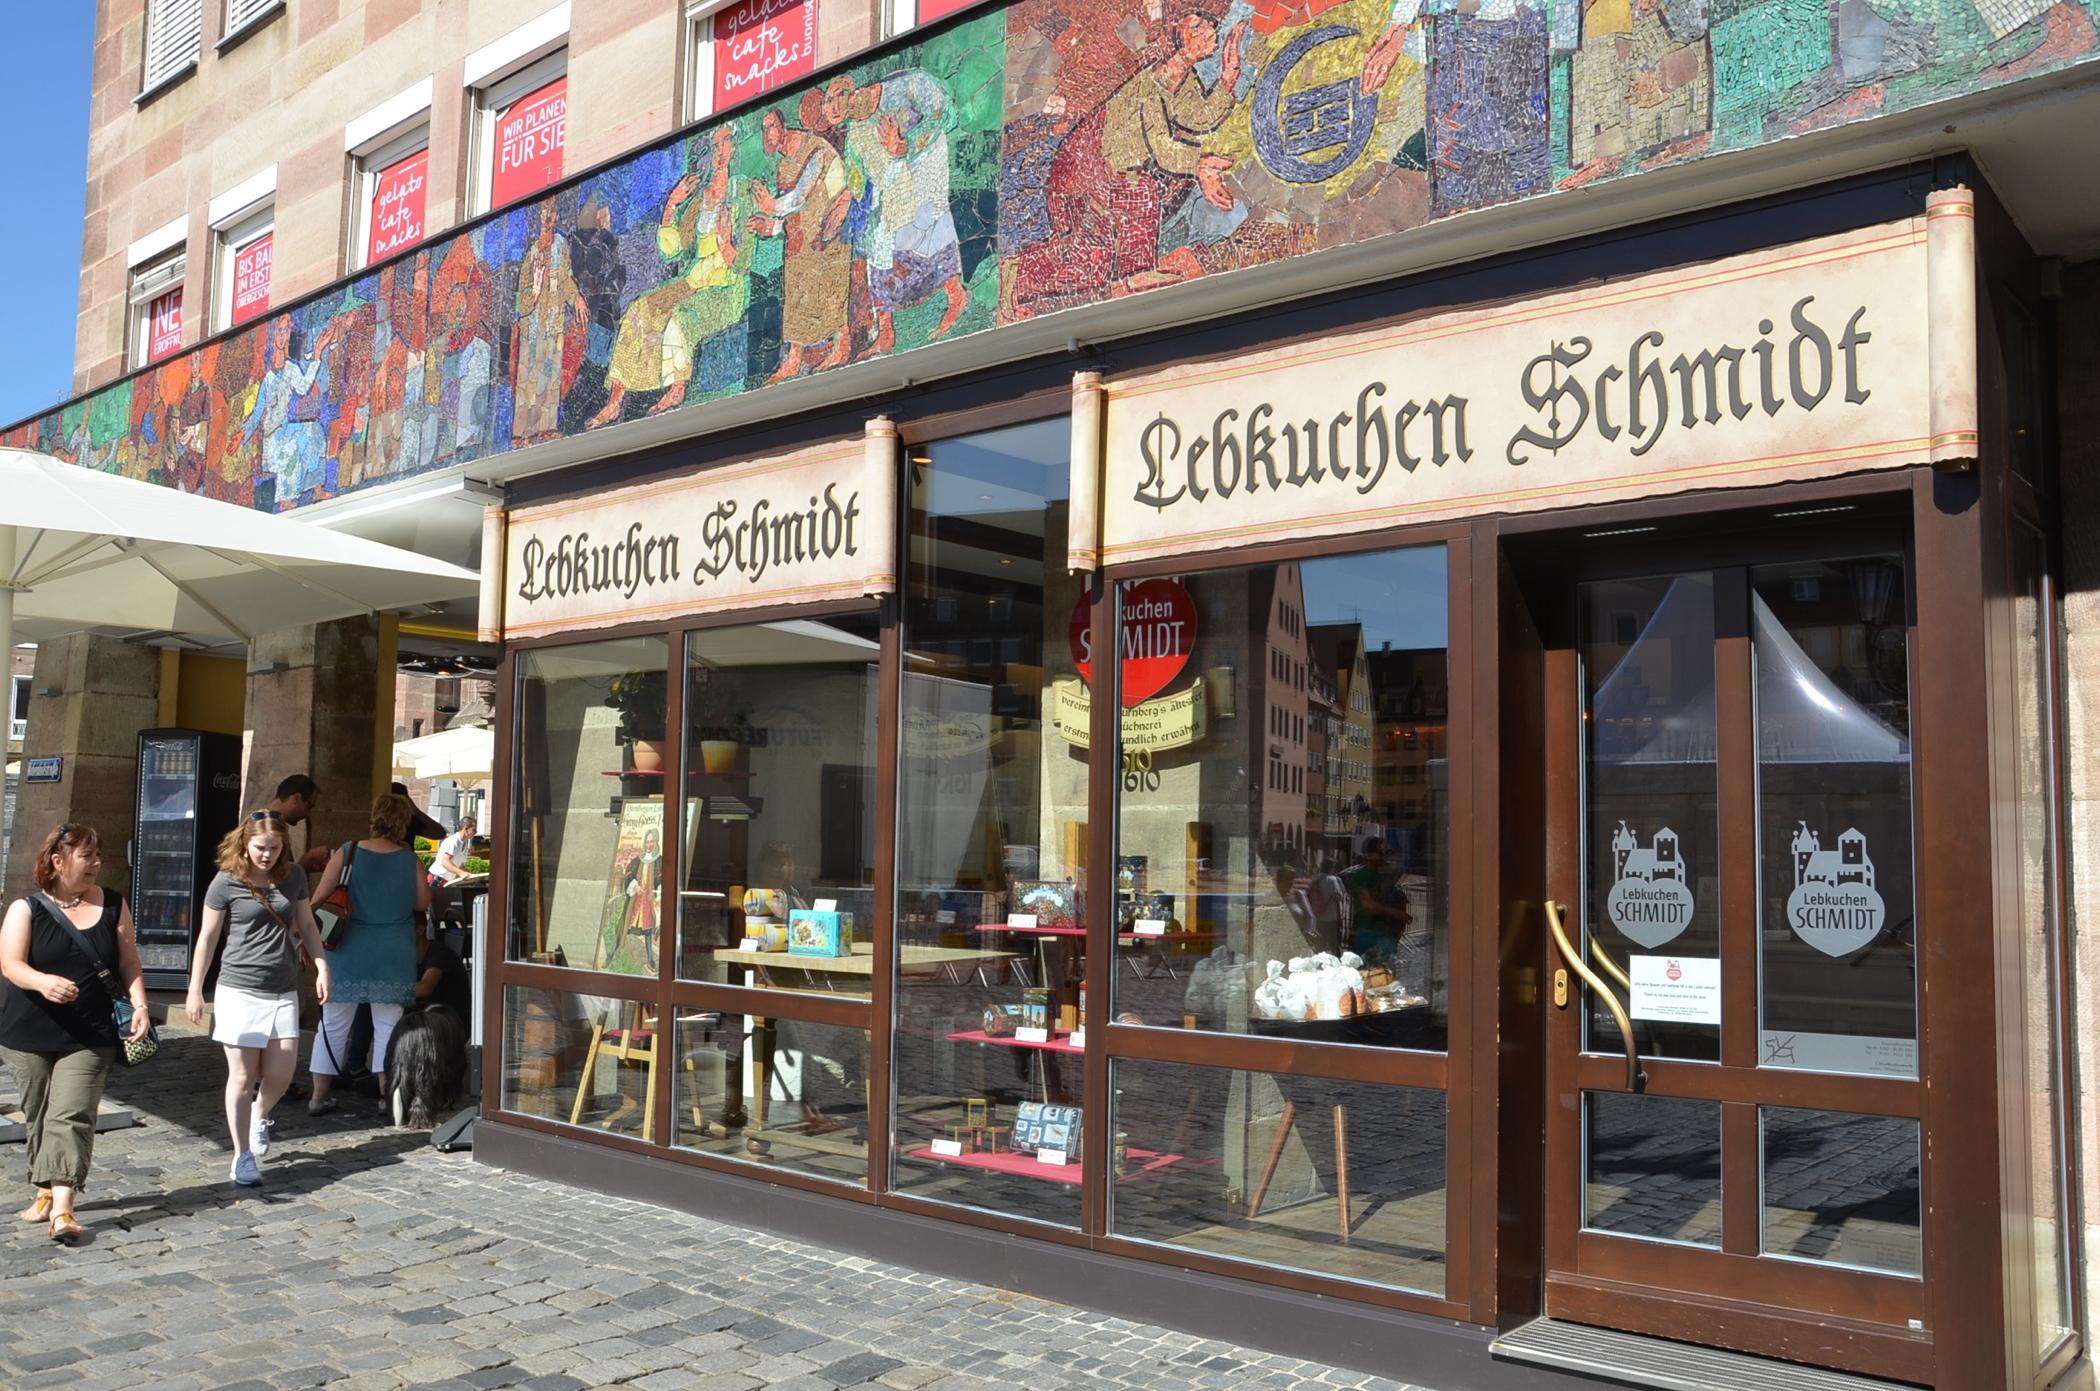 Deutsche Küche Nürnberg | Leckeres Franken Die Besten Restaurants In Nurnberg